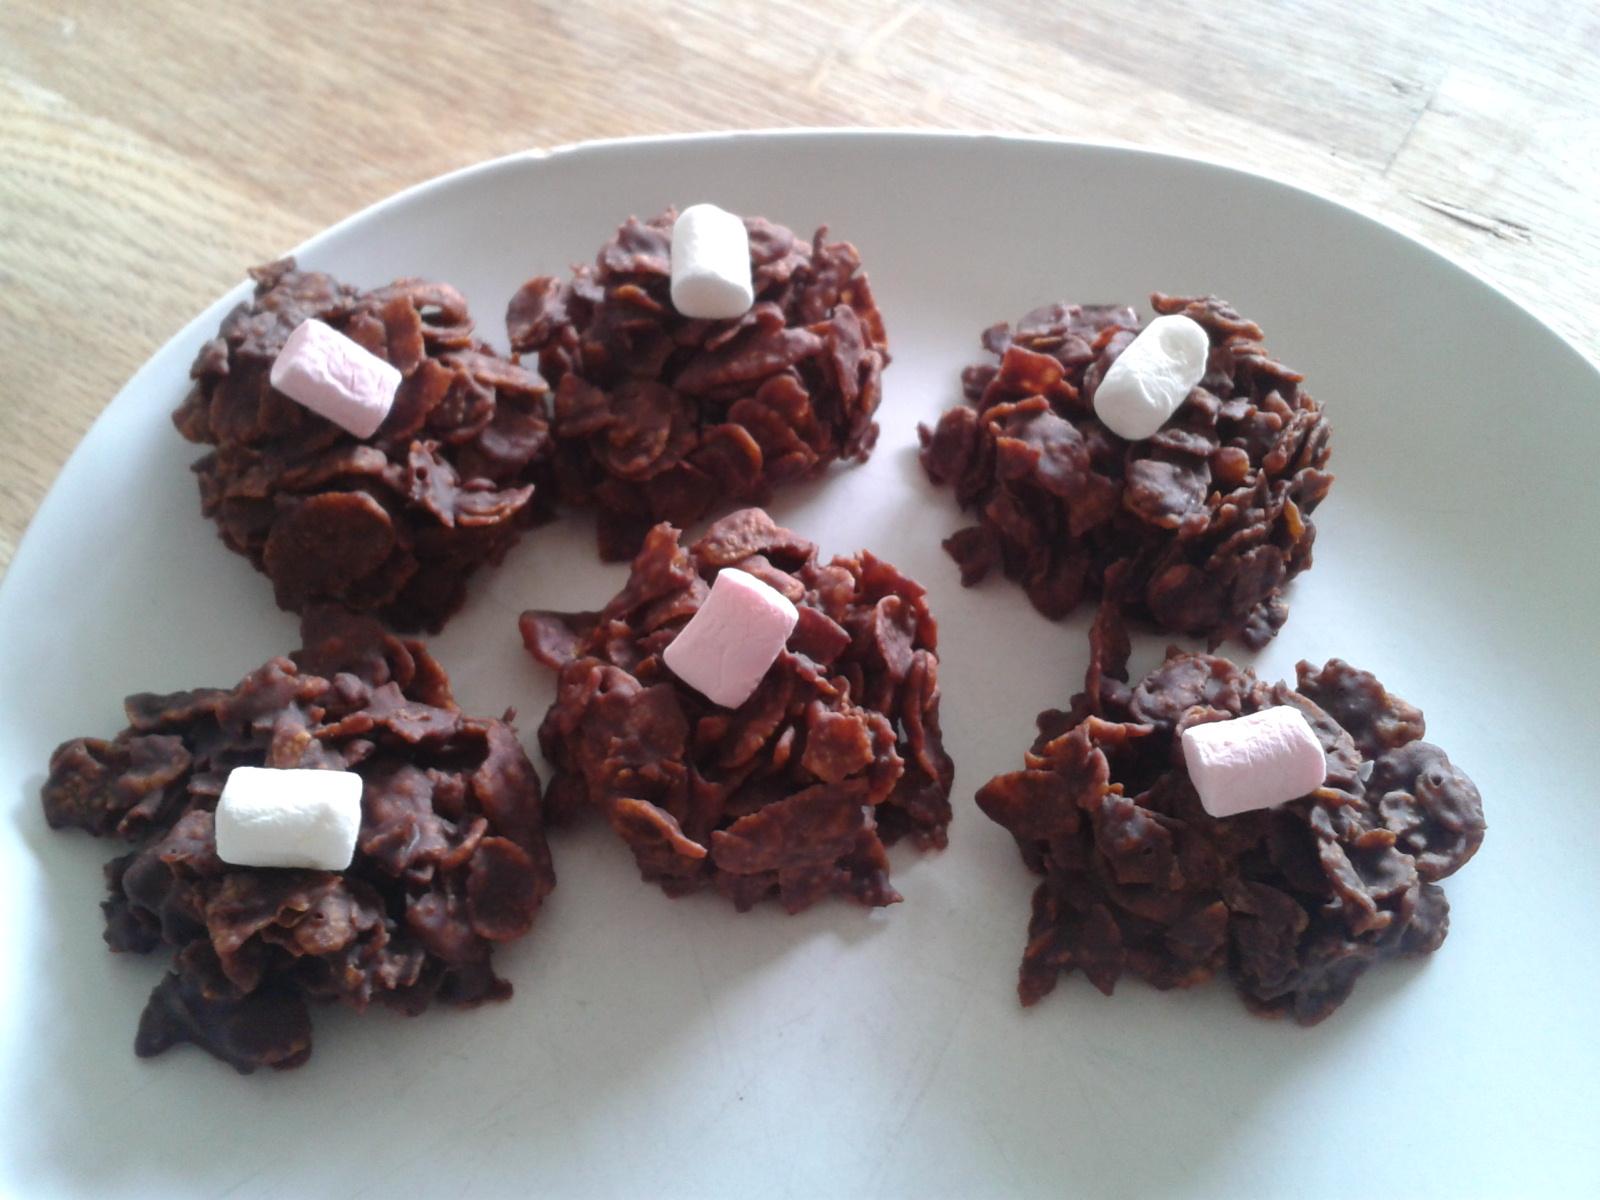 Chocolate And Marshmallow Cornflake Cakes